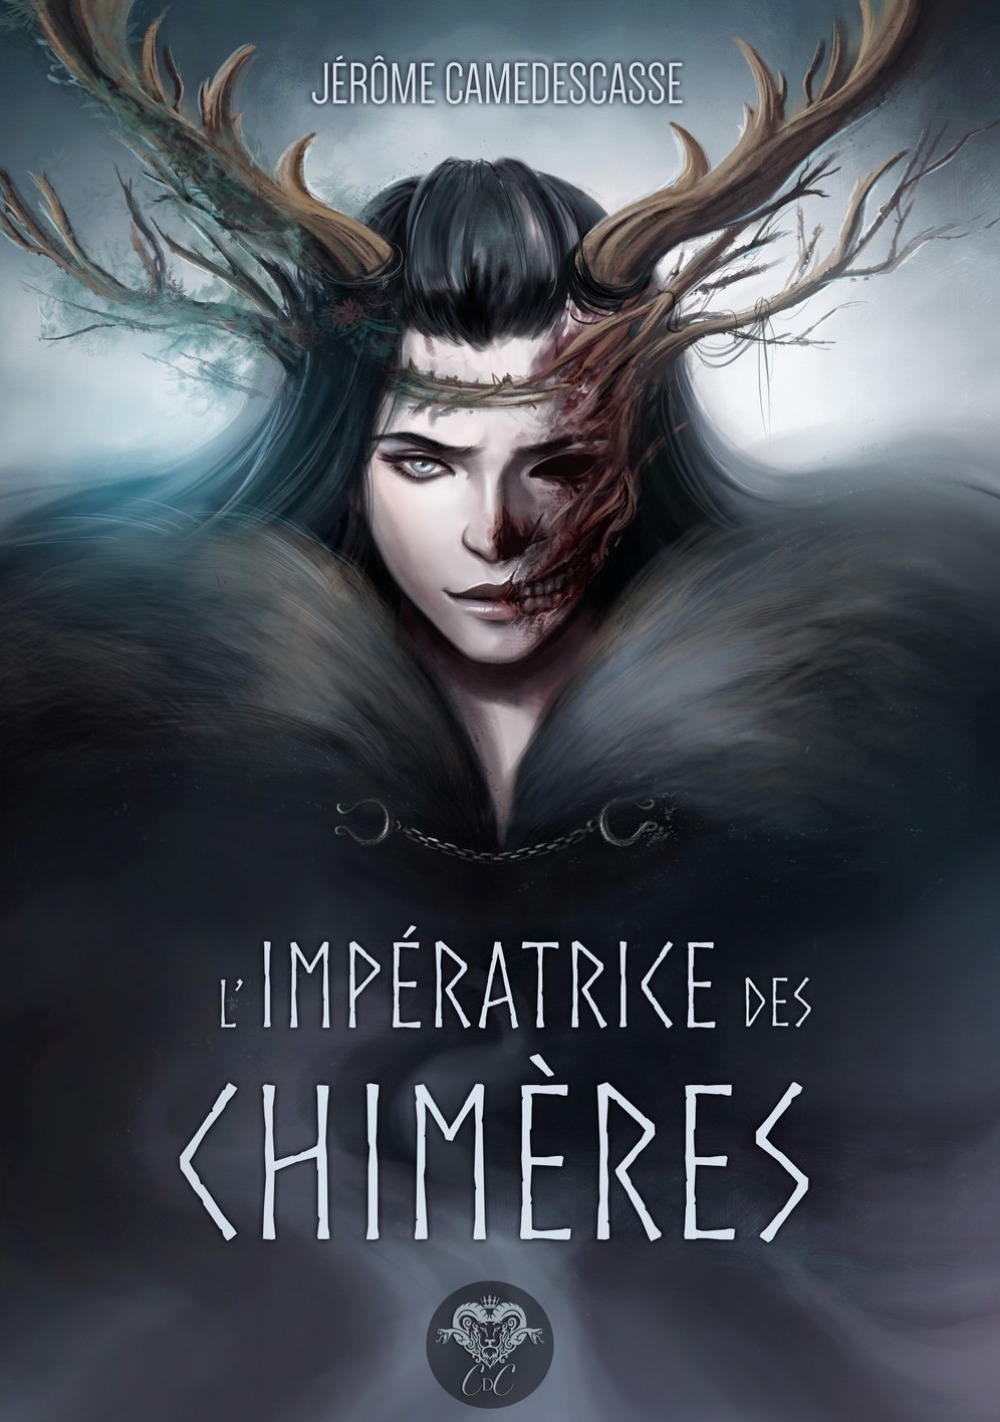 L IMPERATRICE DES CHIMERES